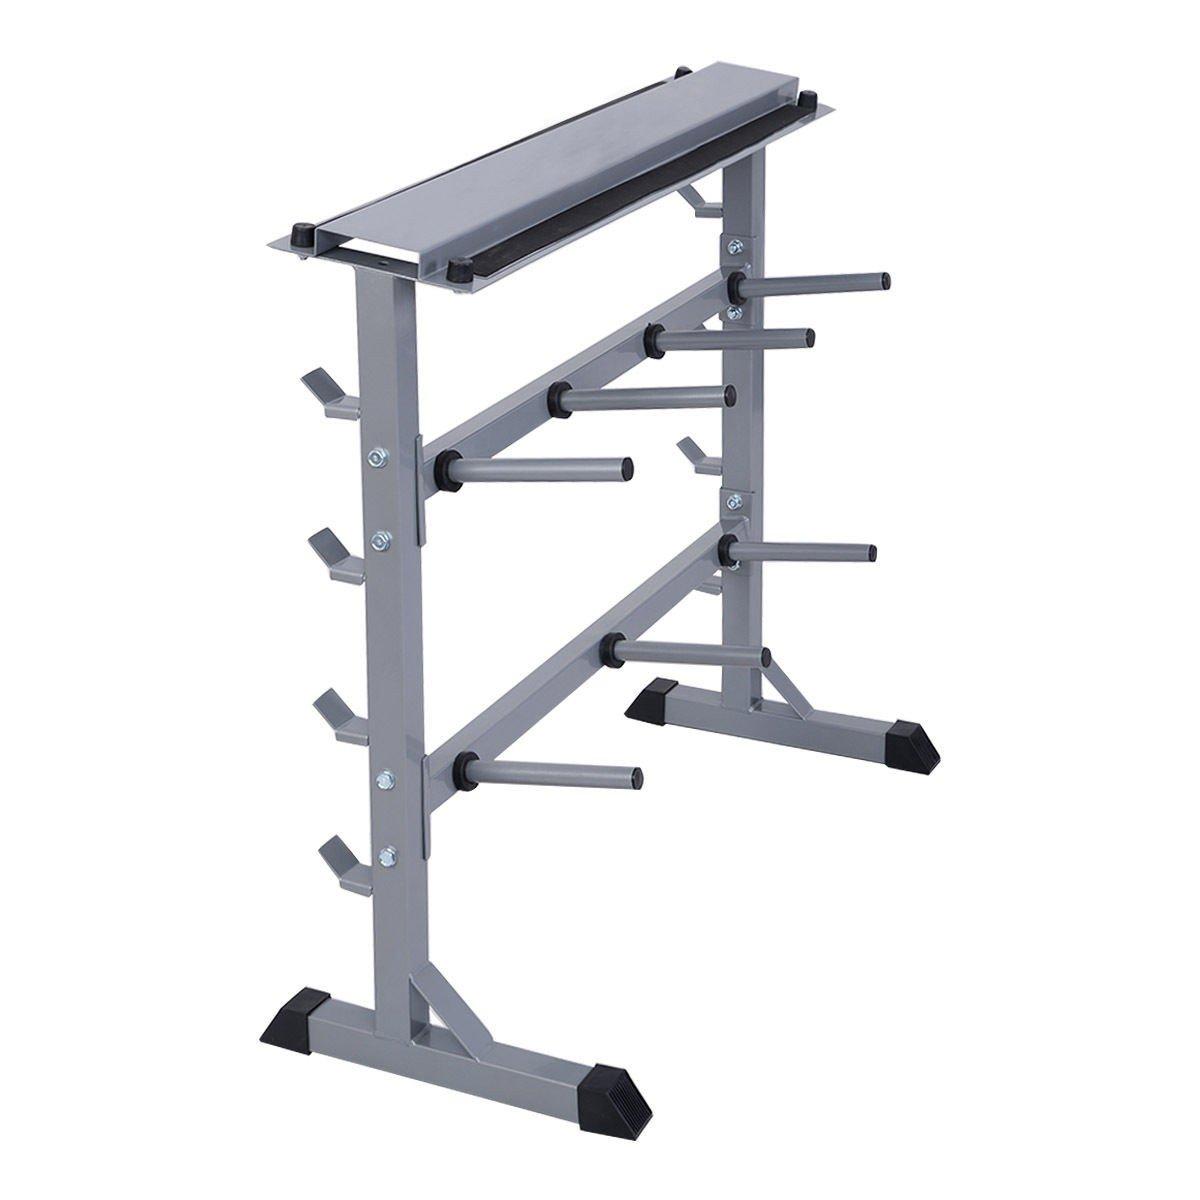 DreamHank 2-Tier 40'' Barbell Rack Weights Storage Stand